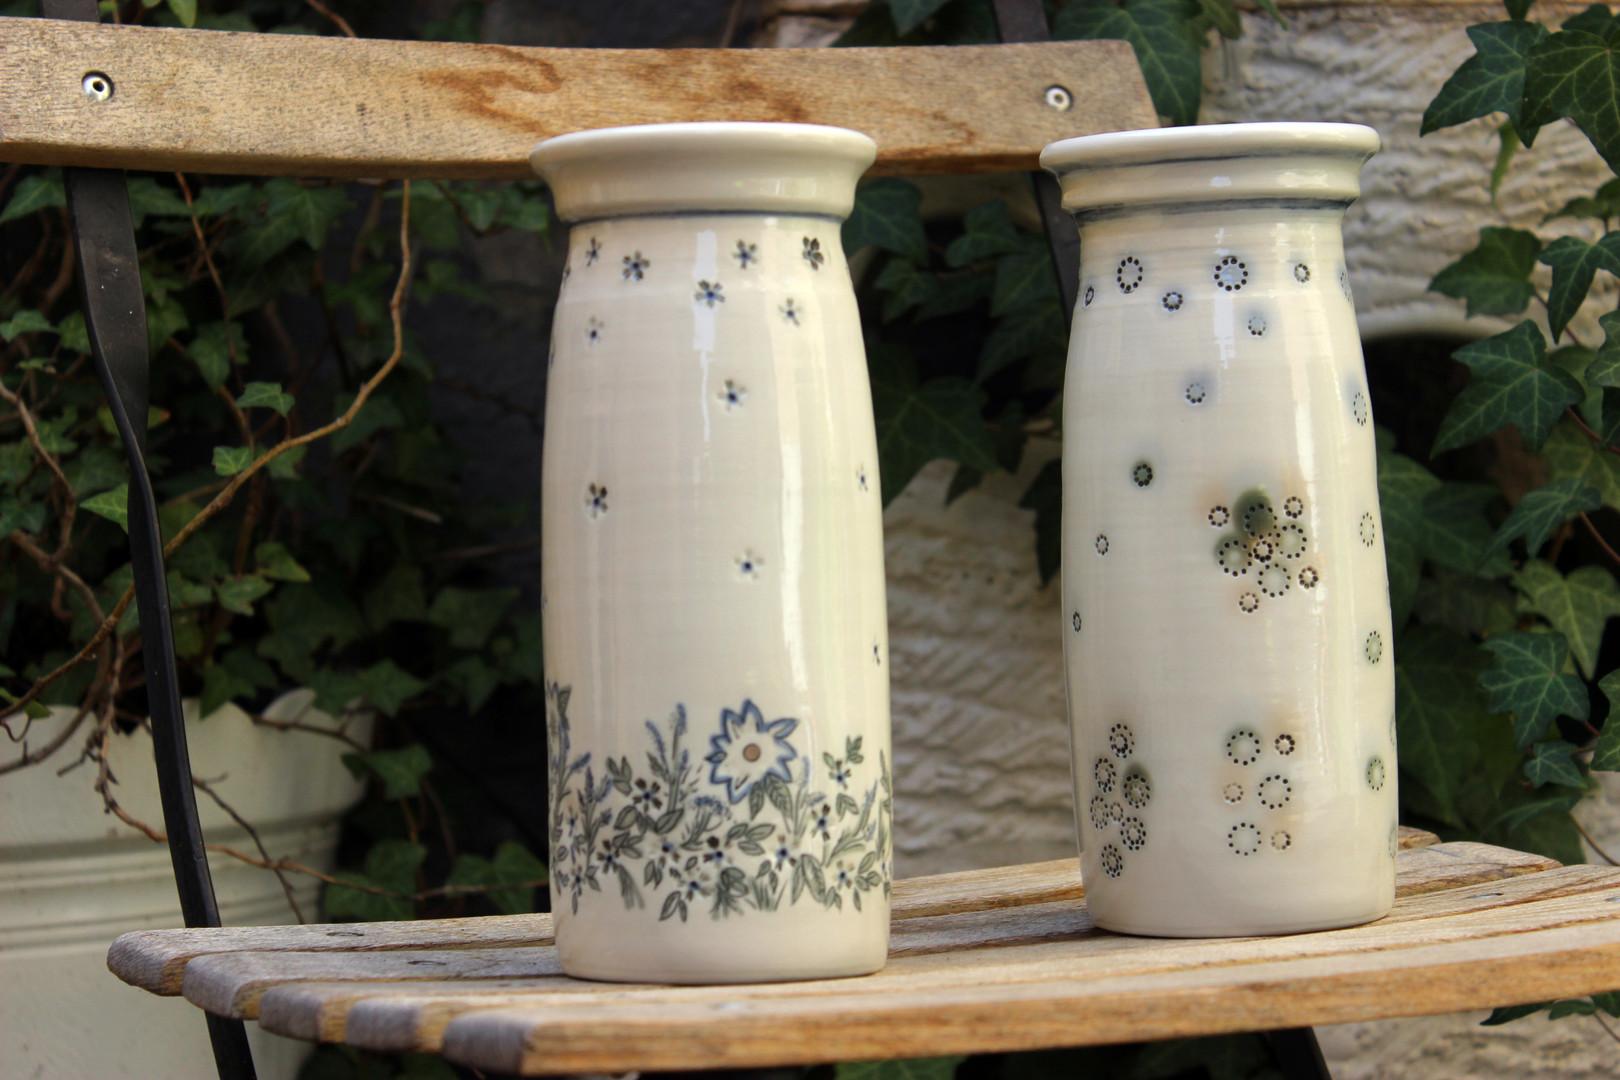 Z kurzu Dekorace vázy